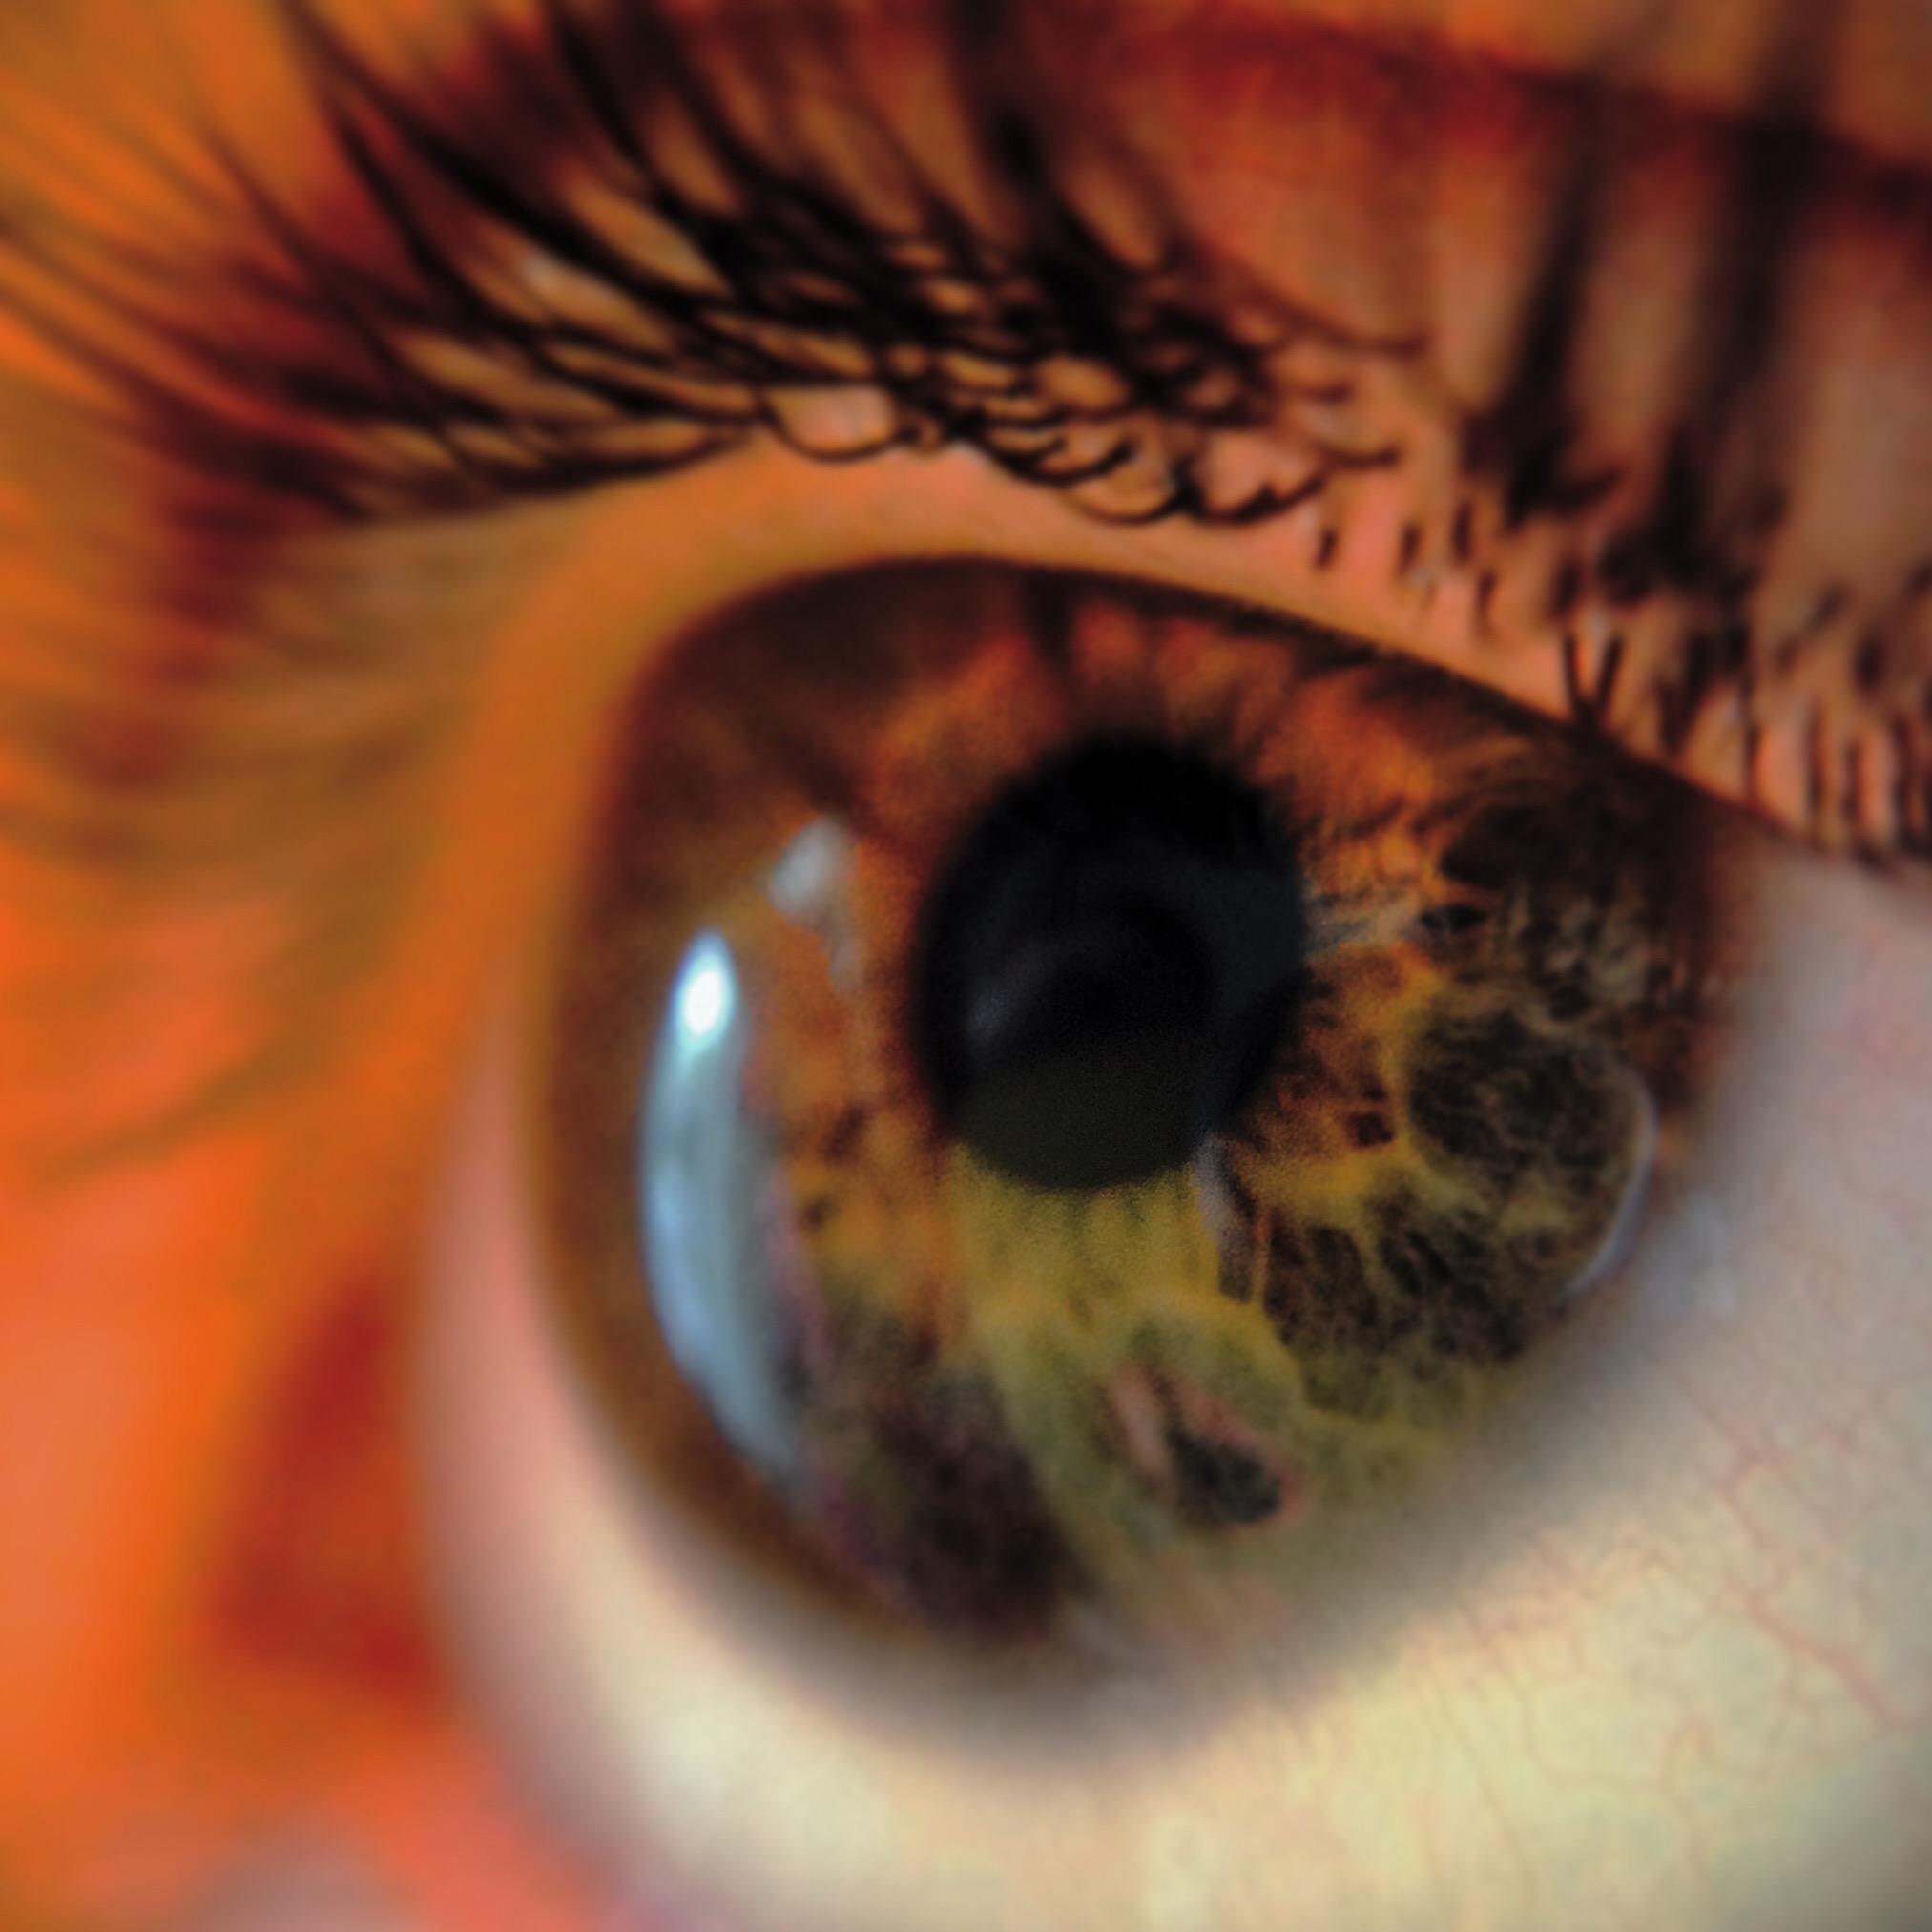 How To Change Wallpaper On Iphone 5c Free Stock Photo Of Close Up Eye Eyelashes